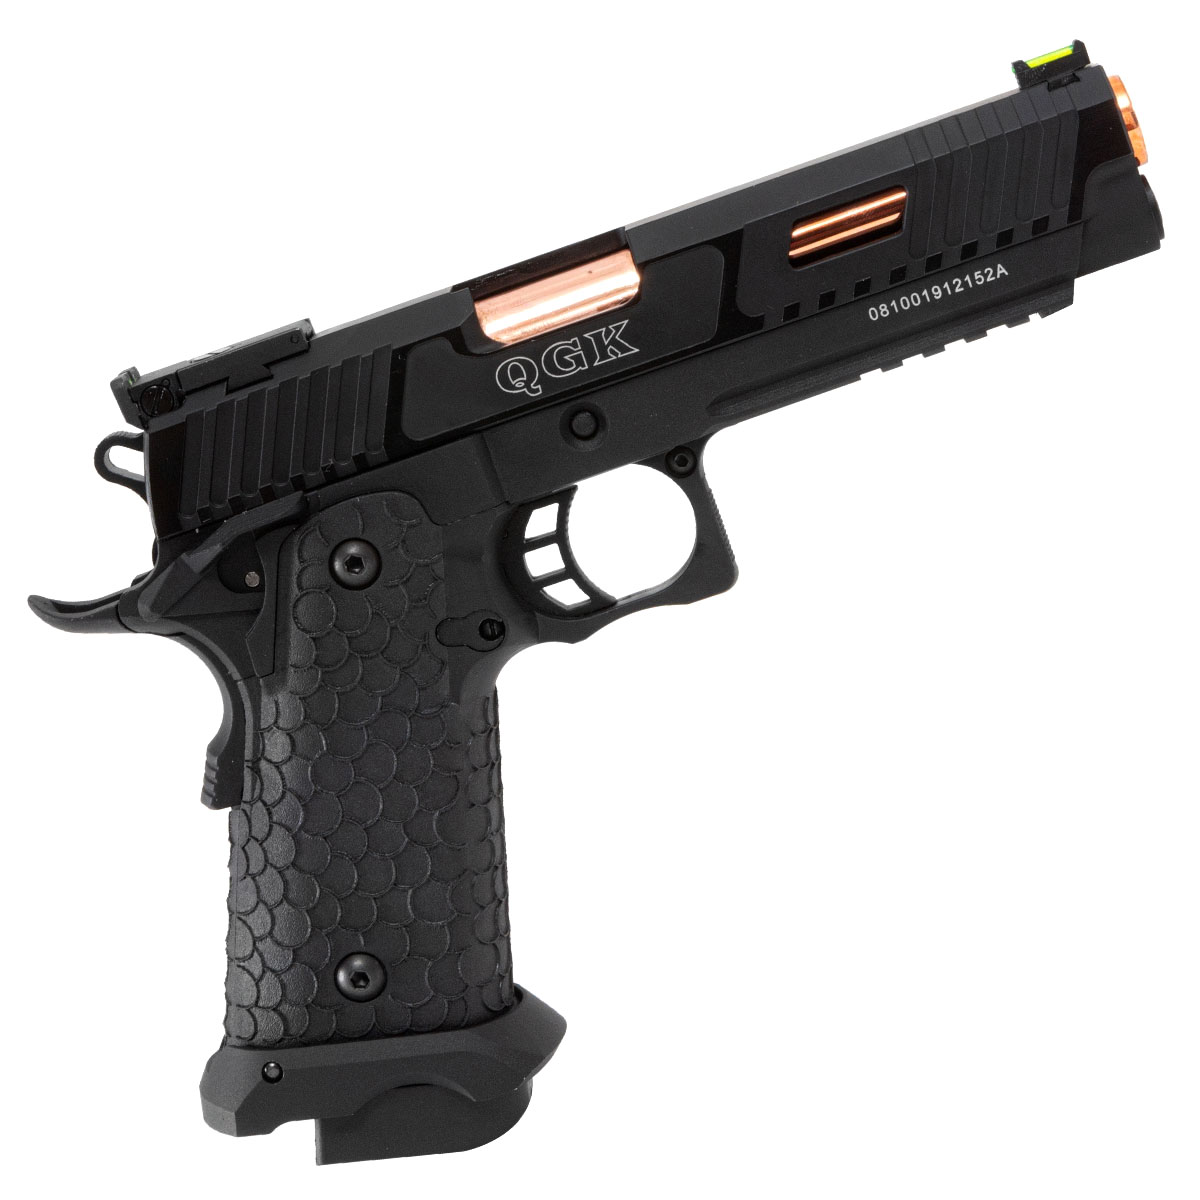 Pistola de Pressão BABAYAGA HP 5.1 QGK Full Metal 4.5mm